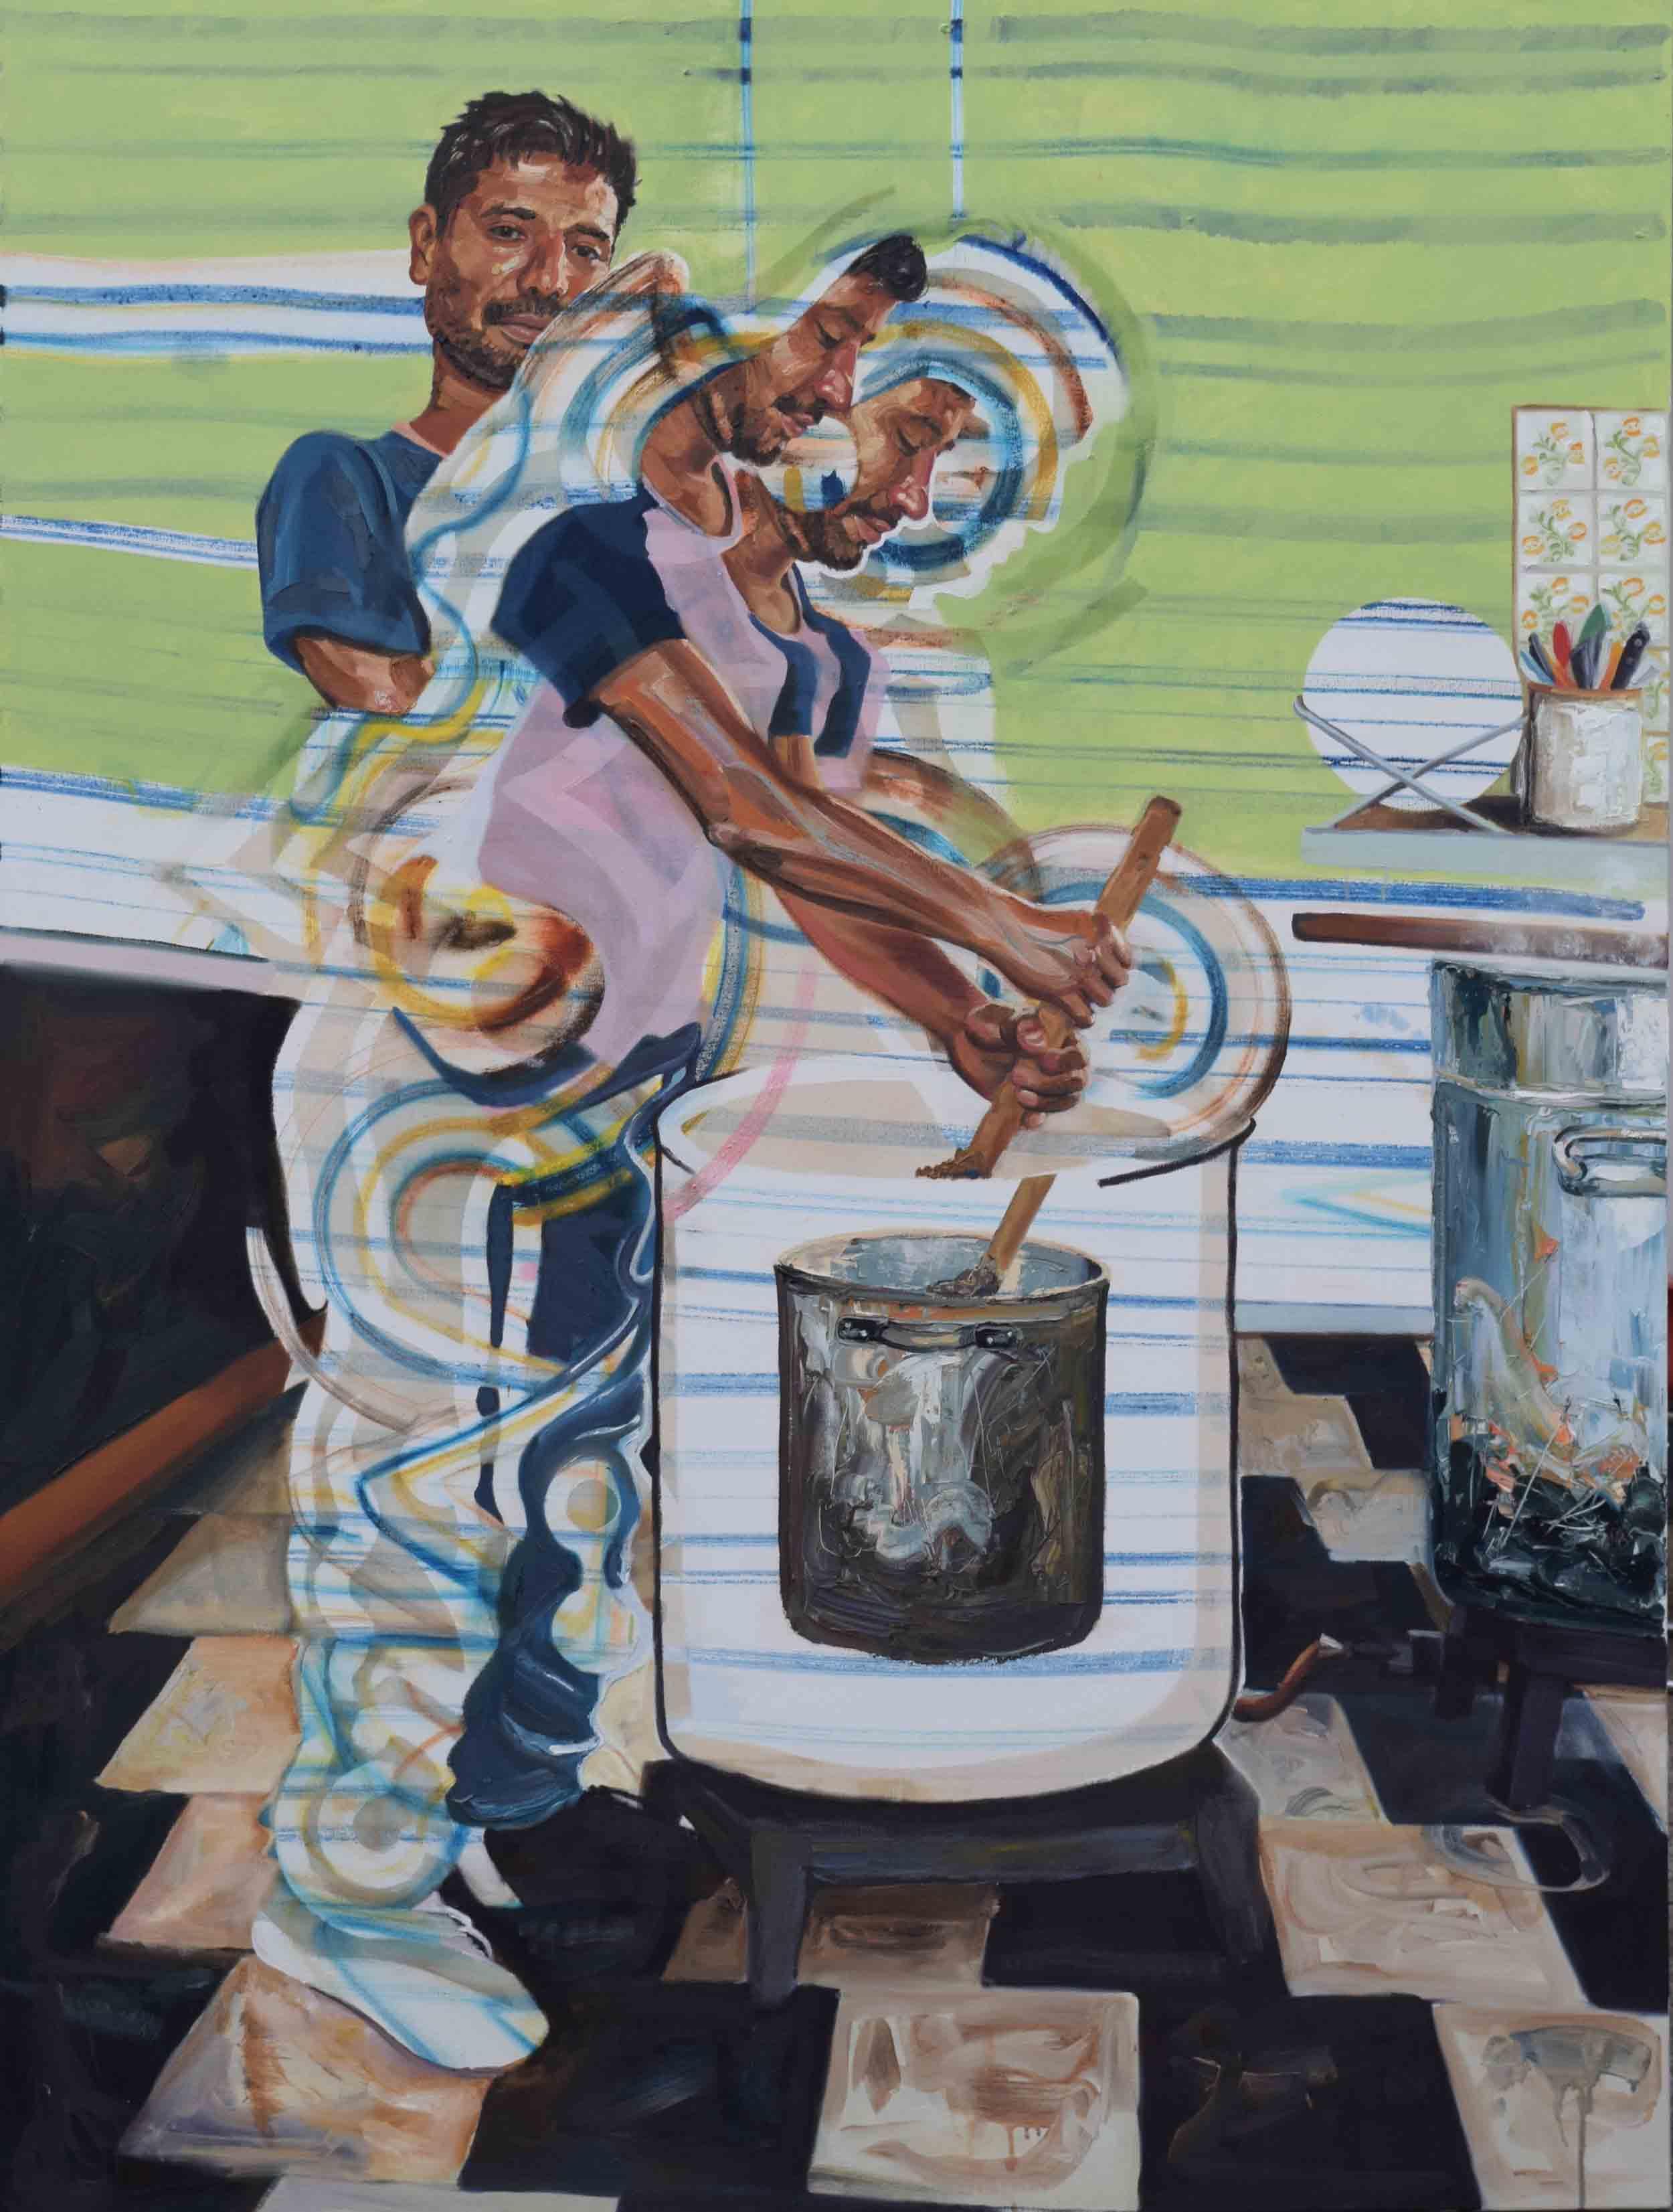 laurence jansen, Disorient, 2018, oil on canvas, 203x152cm, art, figurative painting, laurence jansen artist, contemporary art, contemporary painting, london artist, oil painting,